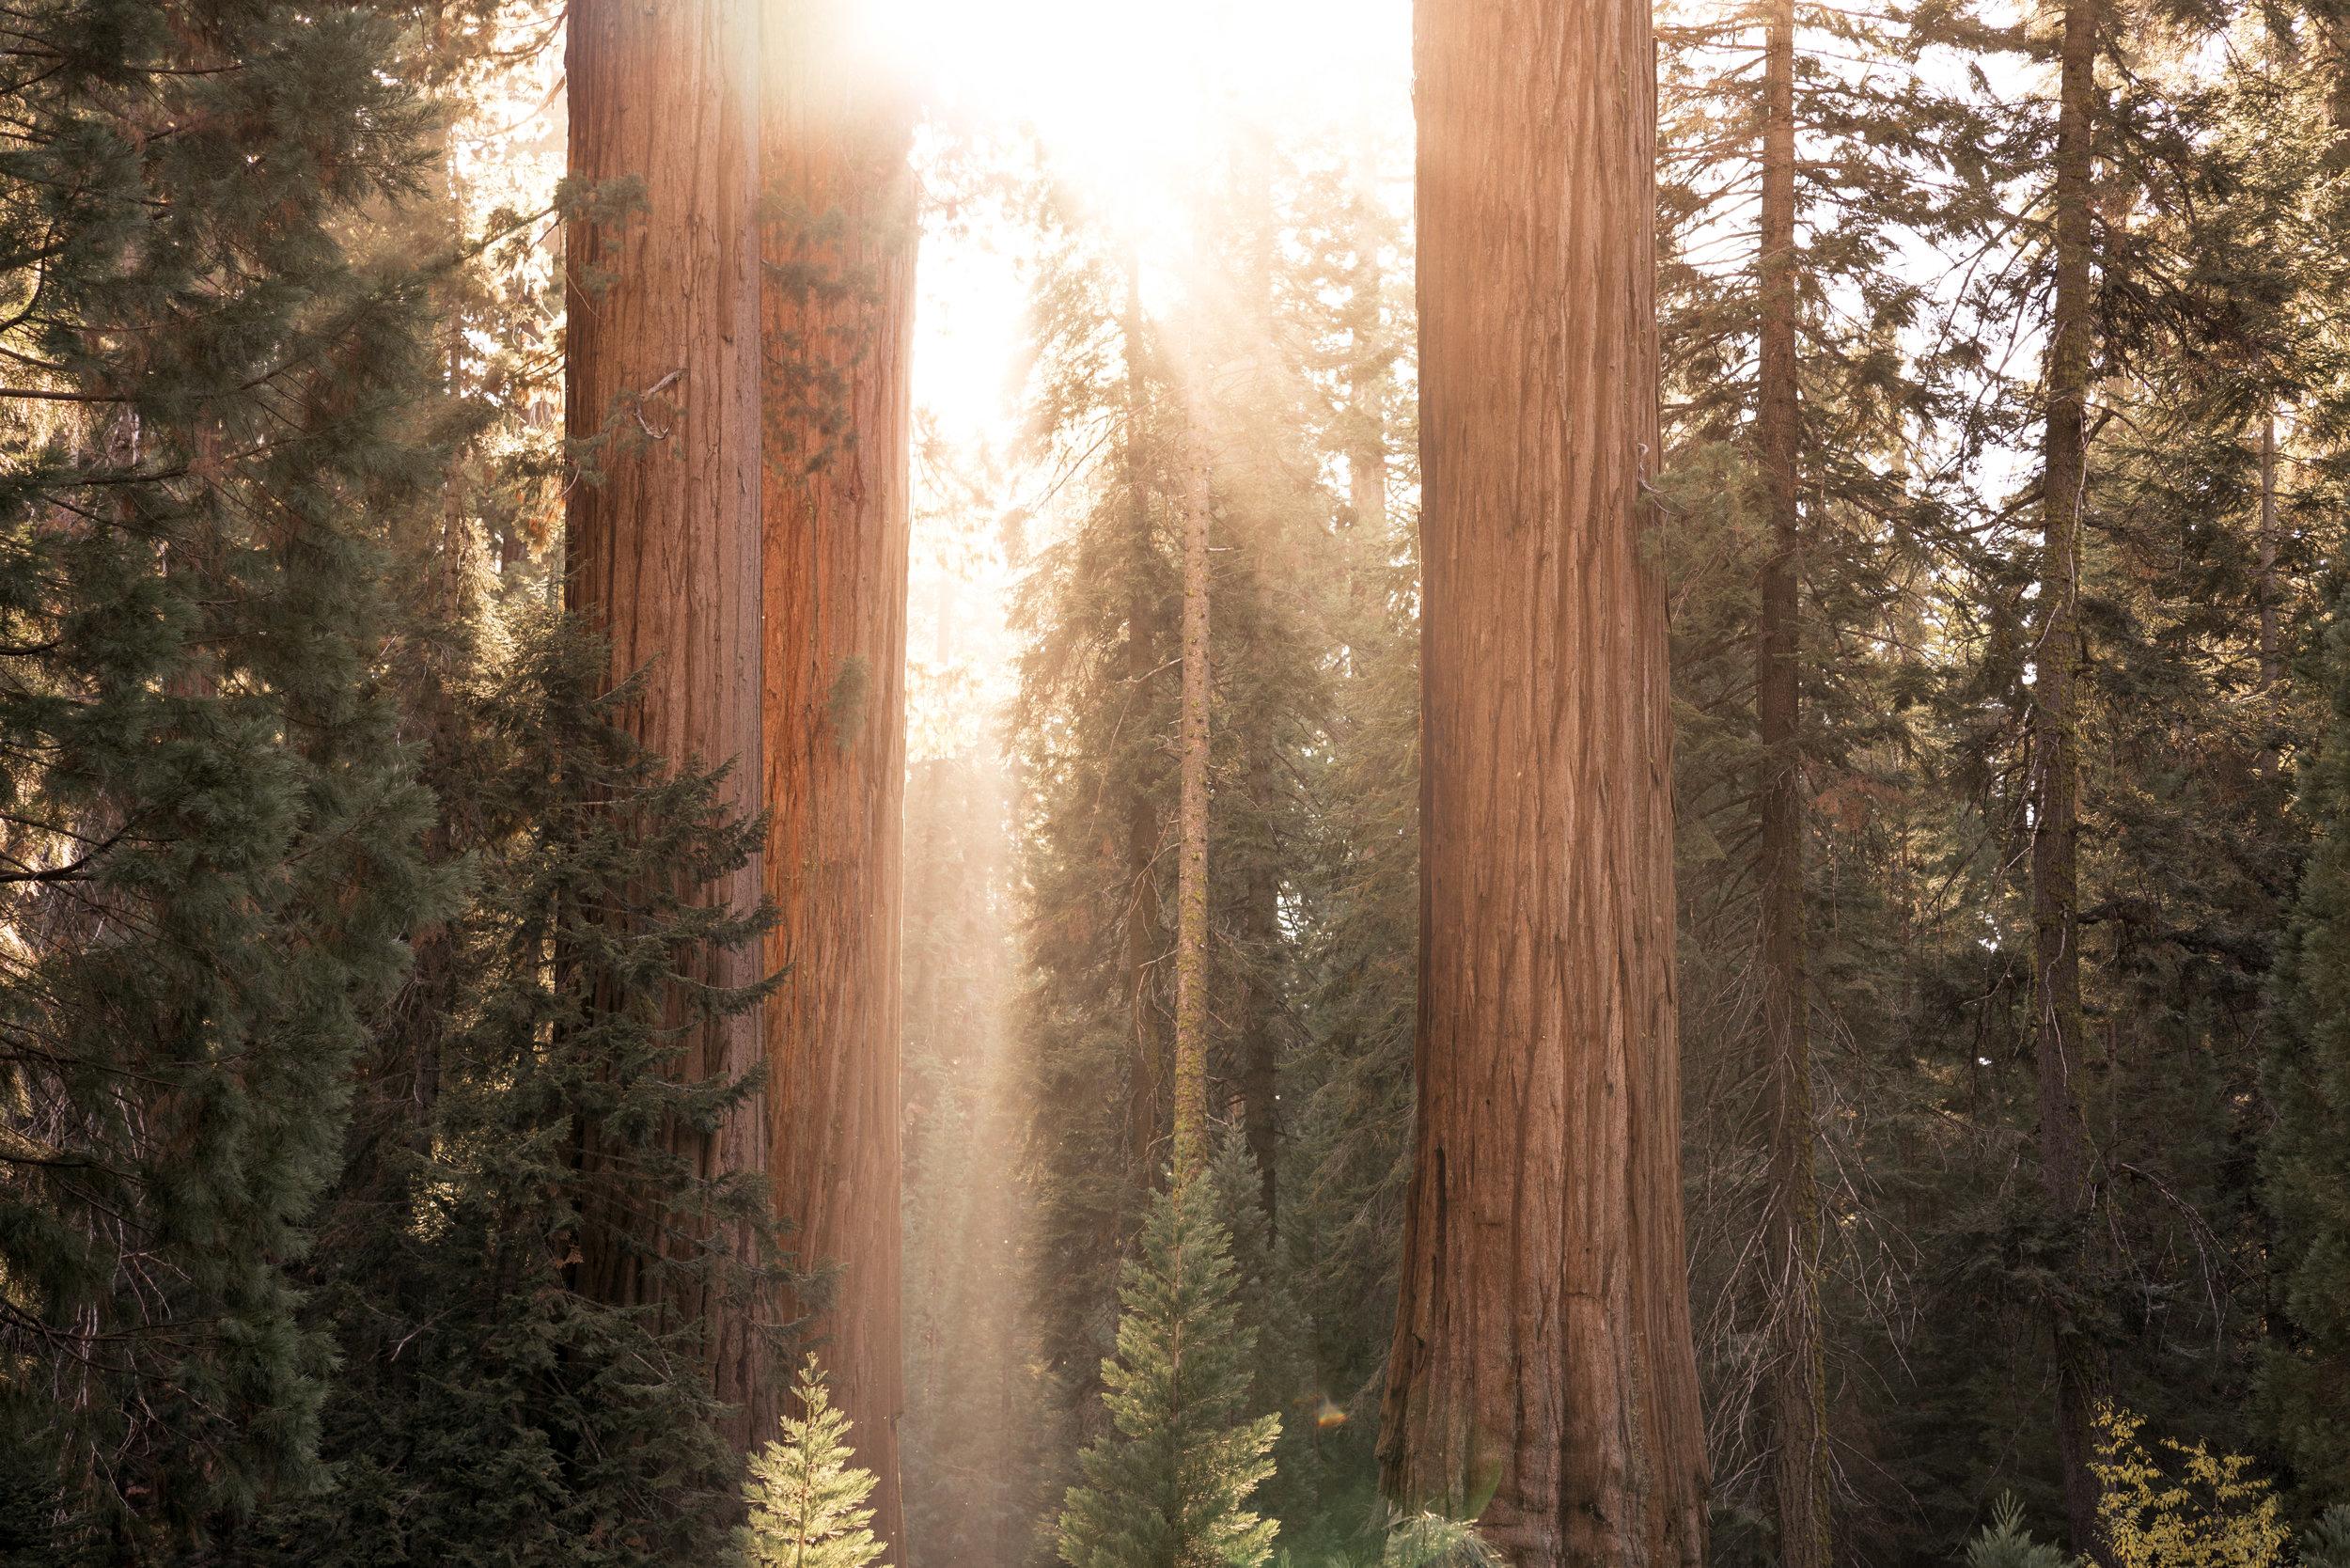 SEQOIA NATIONAL PARK, CALIFORNIA